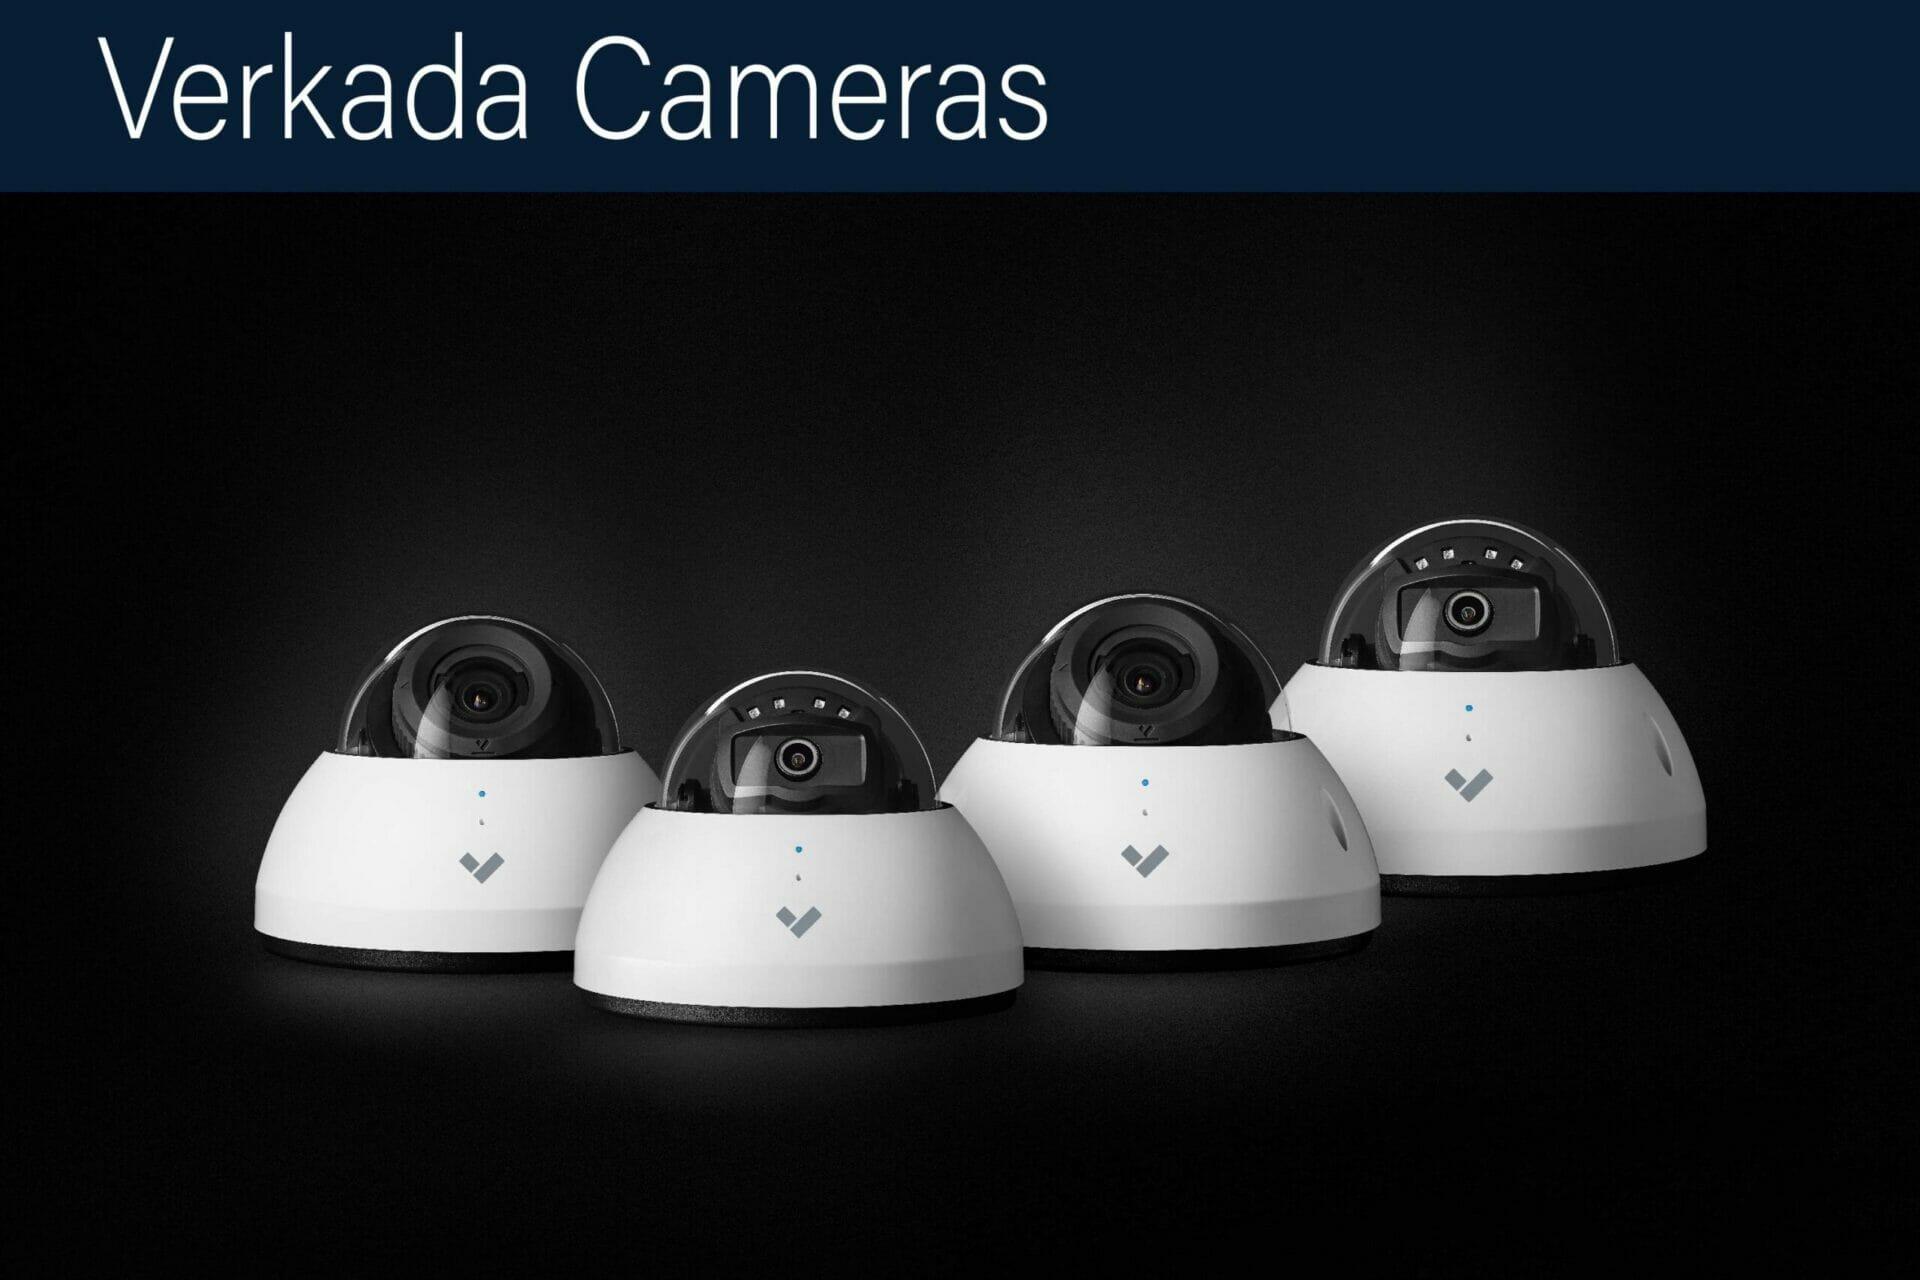 verkada cameras home button